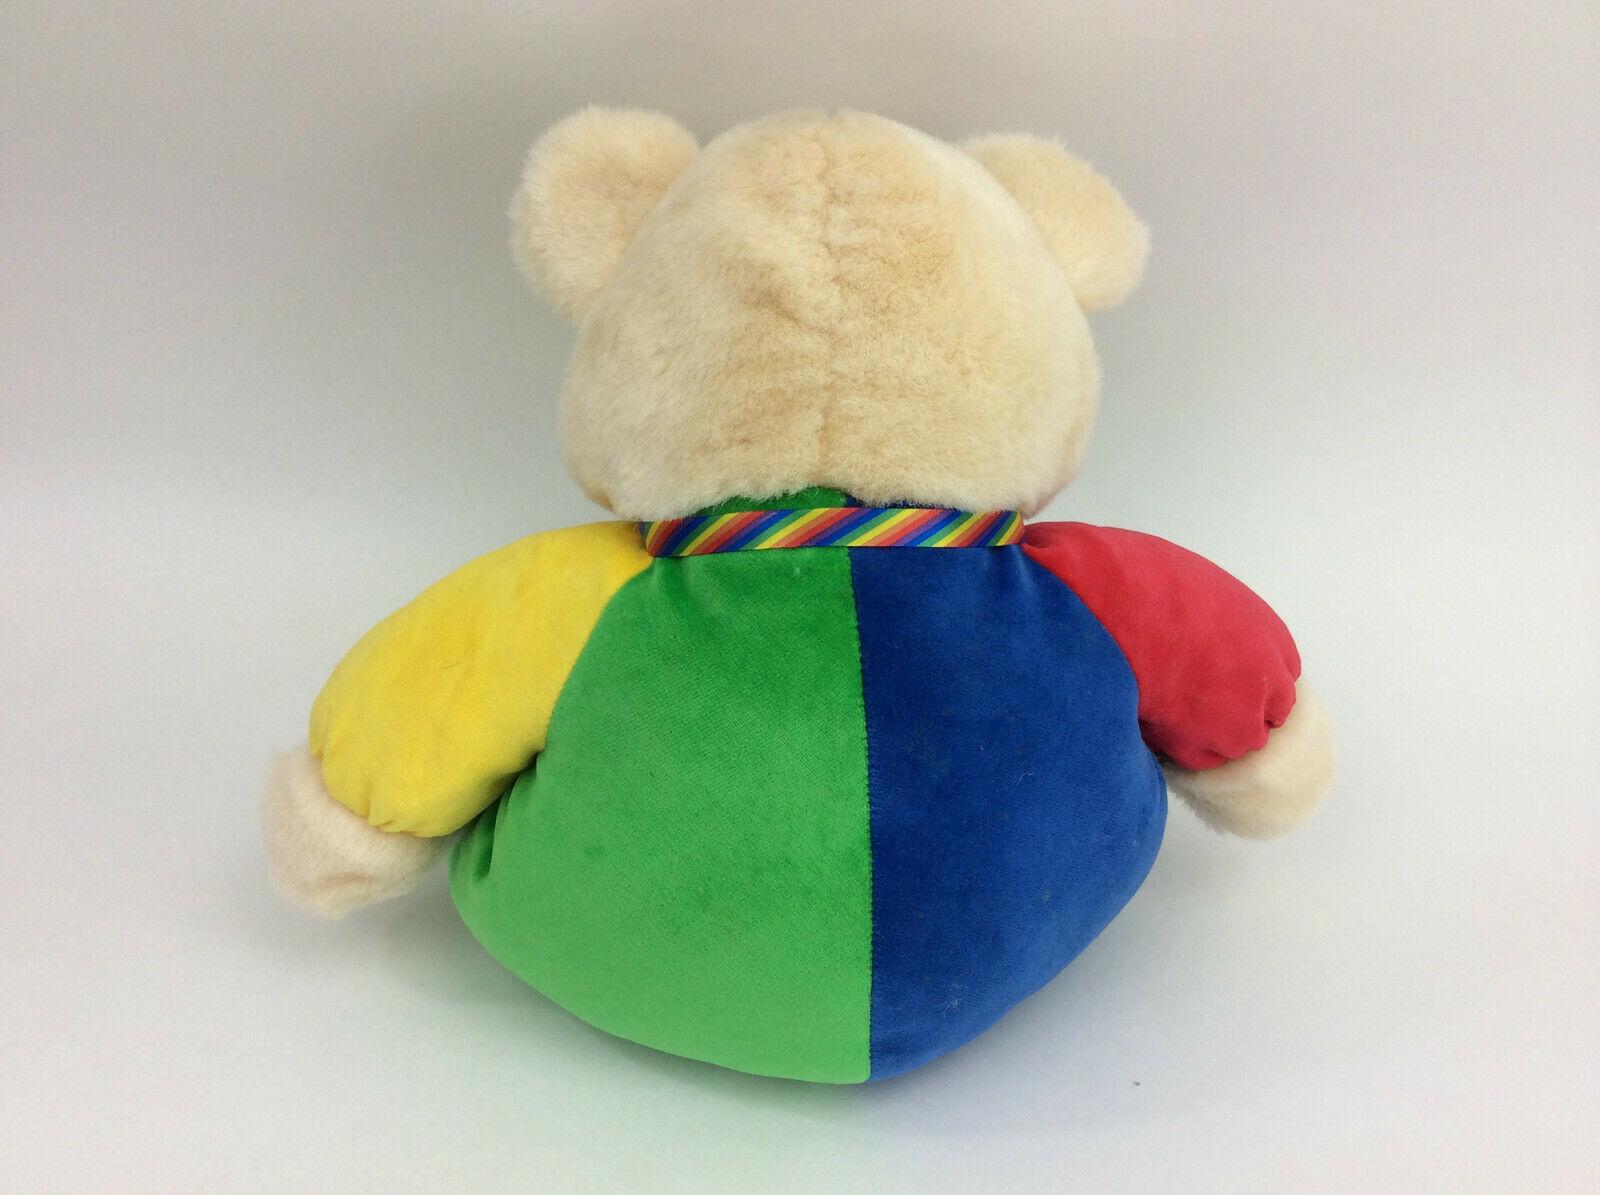 "Baby Ganz Teddy Bear Clown Primary Plush Red Green Yellow Rattle 14"" 1999"